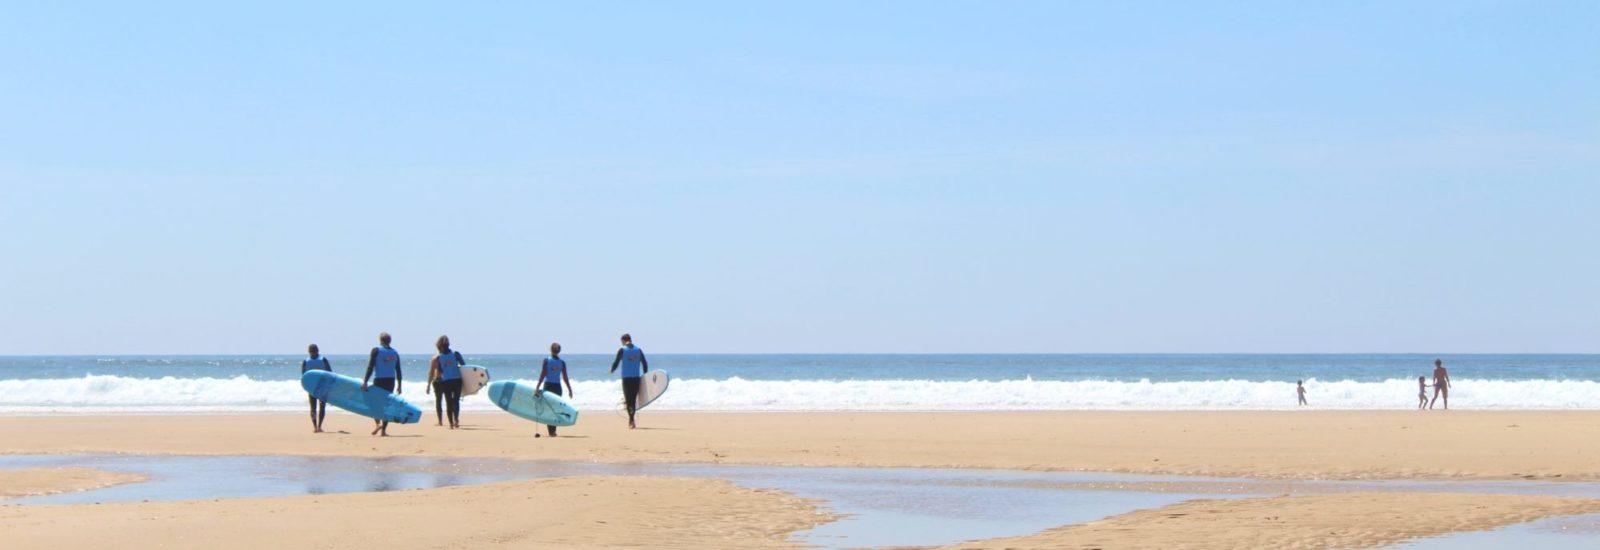 Plage du Grand Crohot Surf Océan